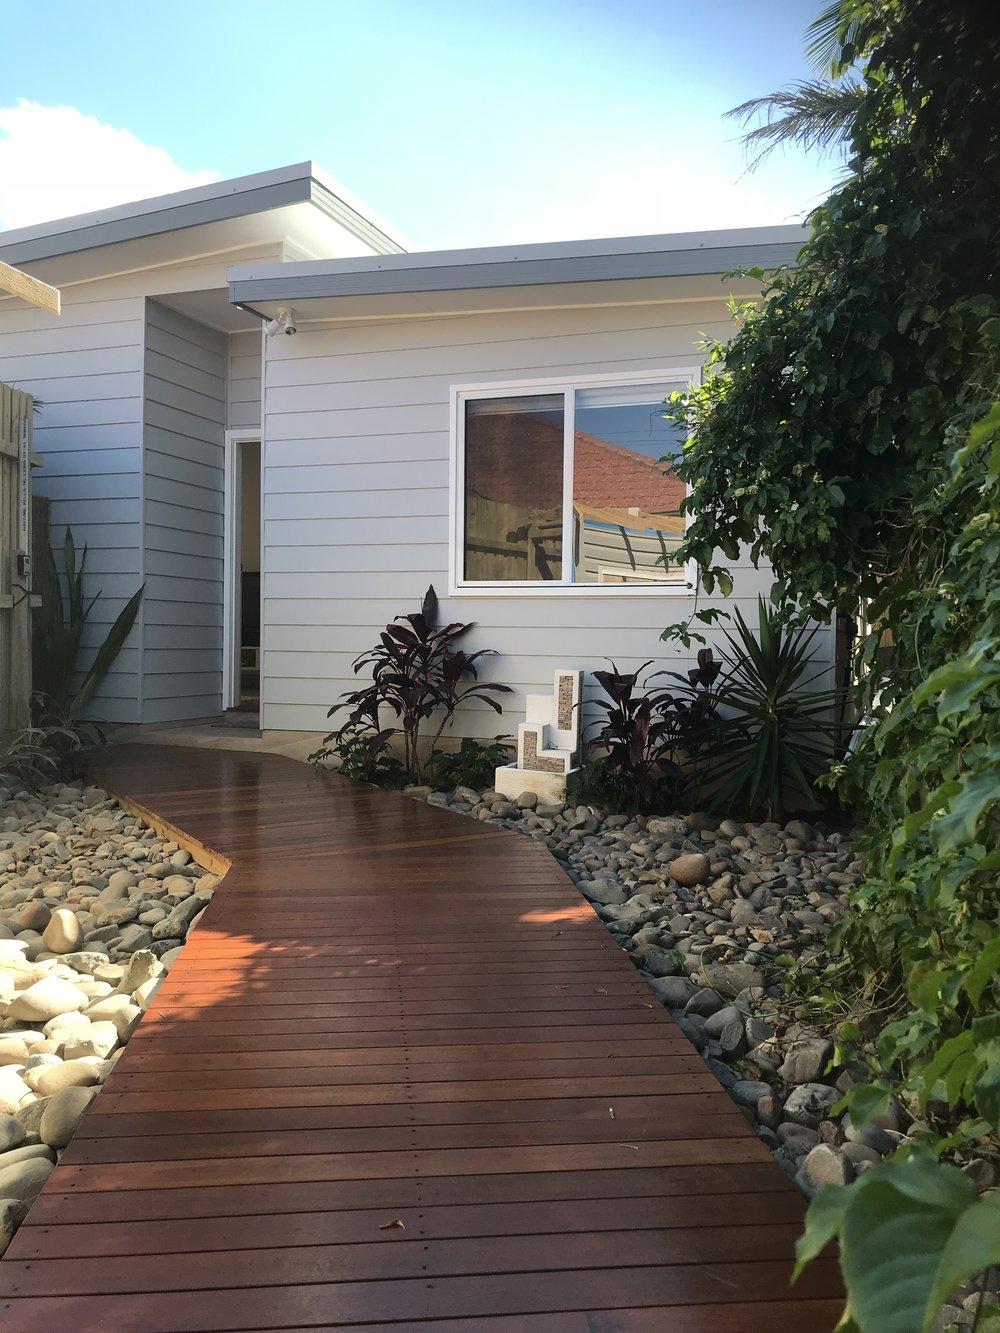 bungalow homes collaroy sydney 23.JPG